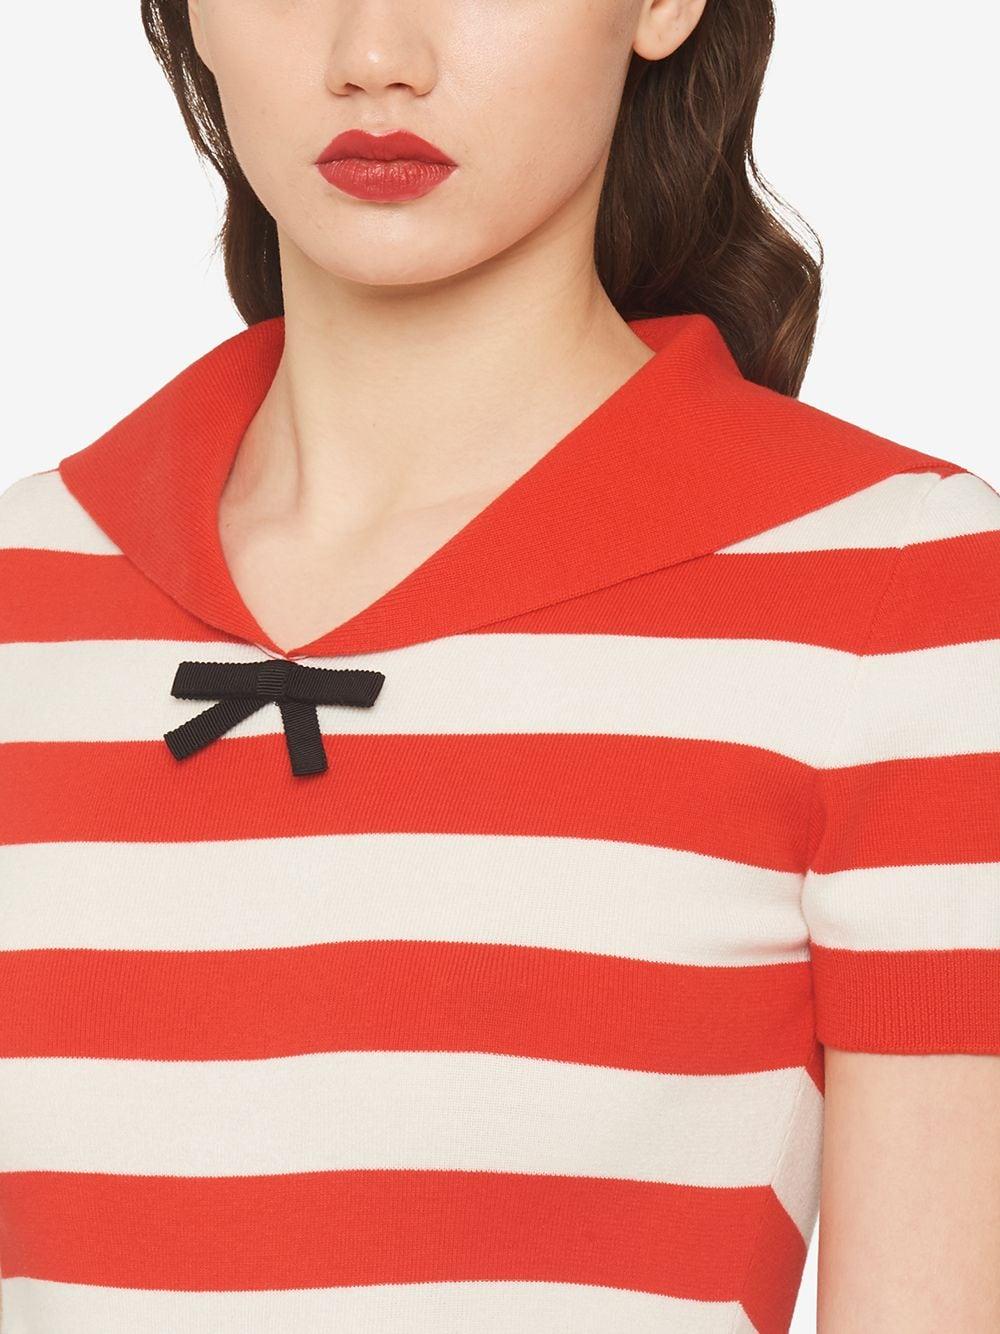 Miu Miu Striped Sailor-Style Top 1155лв